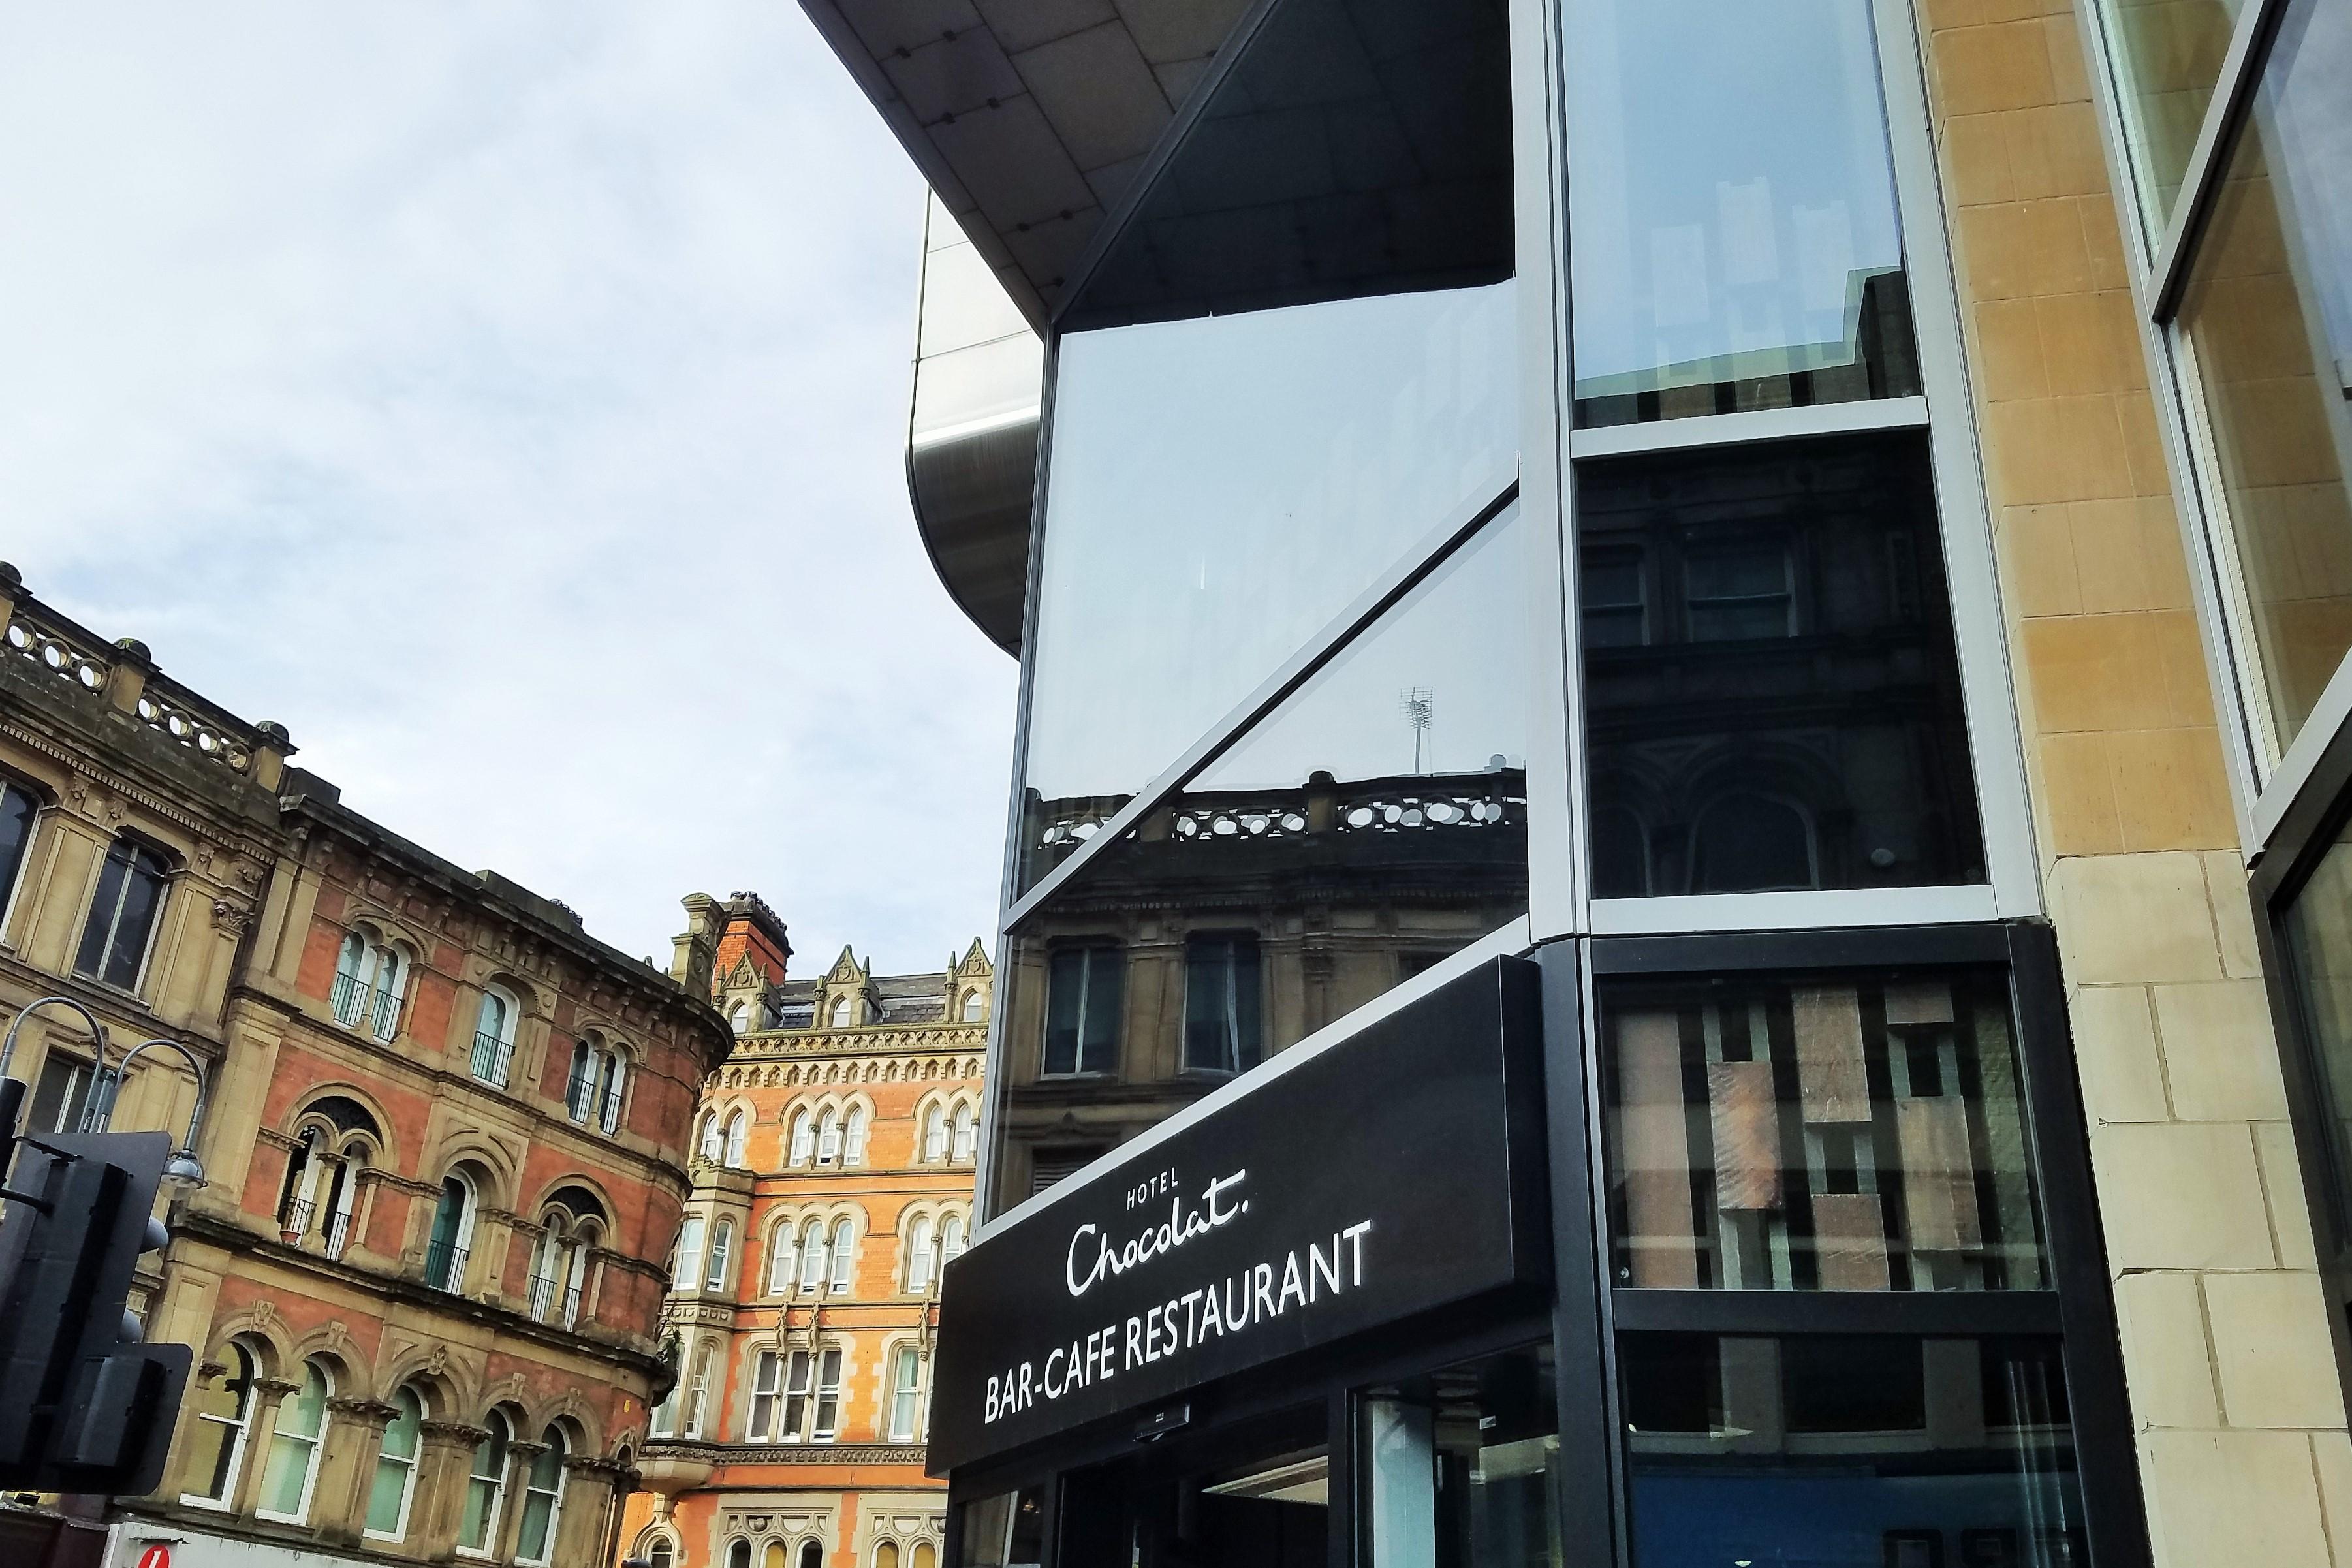 Hotel Chocolat shop front Leeds